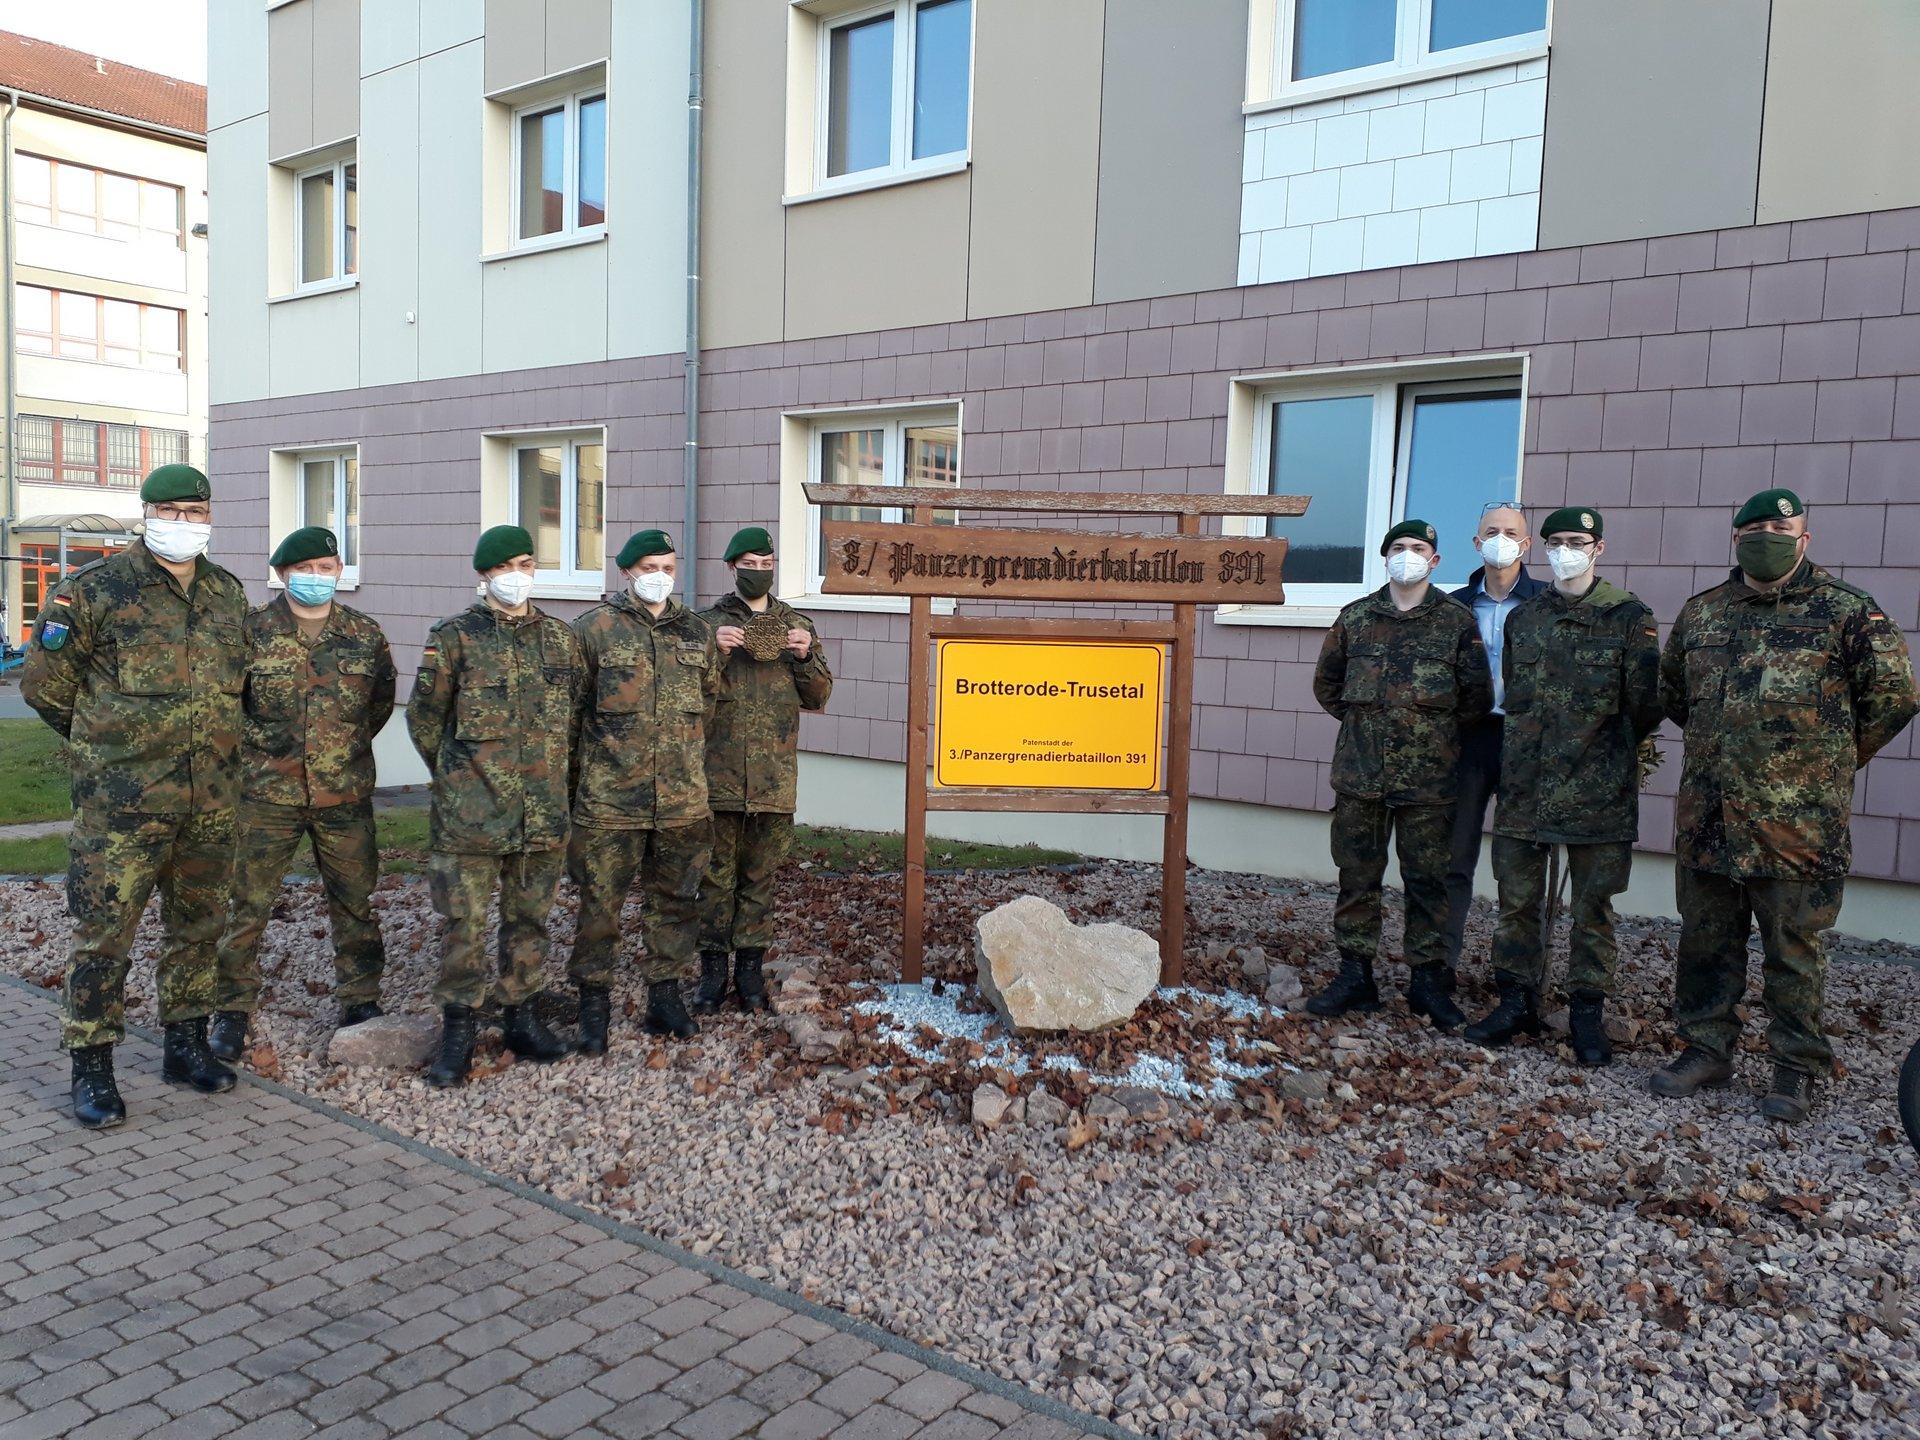 391 pzgrenbtl Panzergrenadierbataillon 391